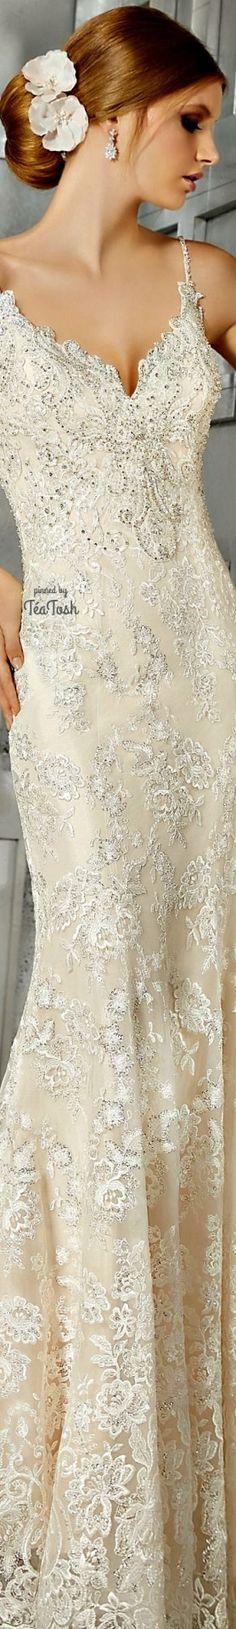 ❇Téa Tosh❇ (Front) Merlada Wedding Dress Older Bride, Weeding Dress, Strapless Dress Formal, Formal Dresses, Mori Lee, Love Story, Our Wedding, Bridal, Dress Ideas